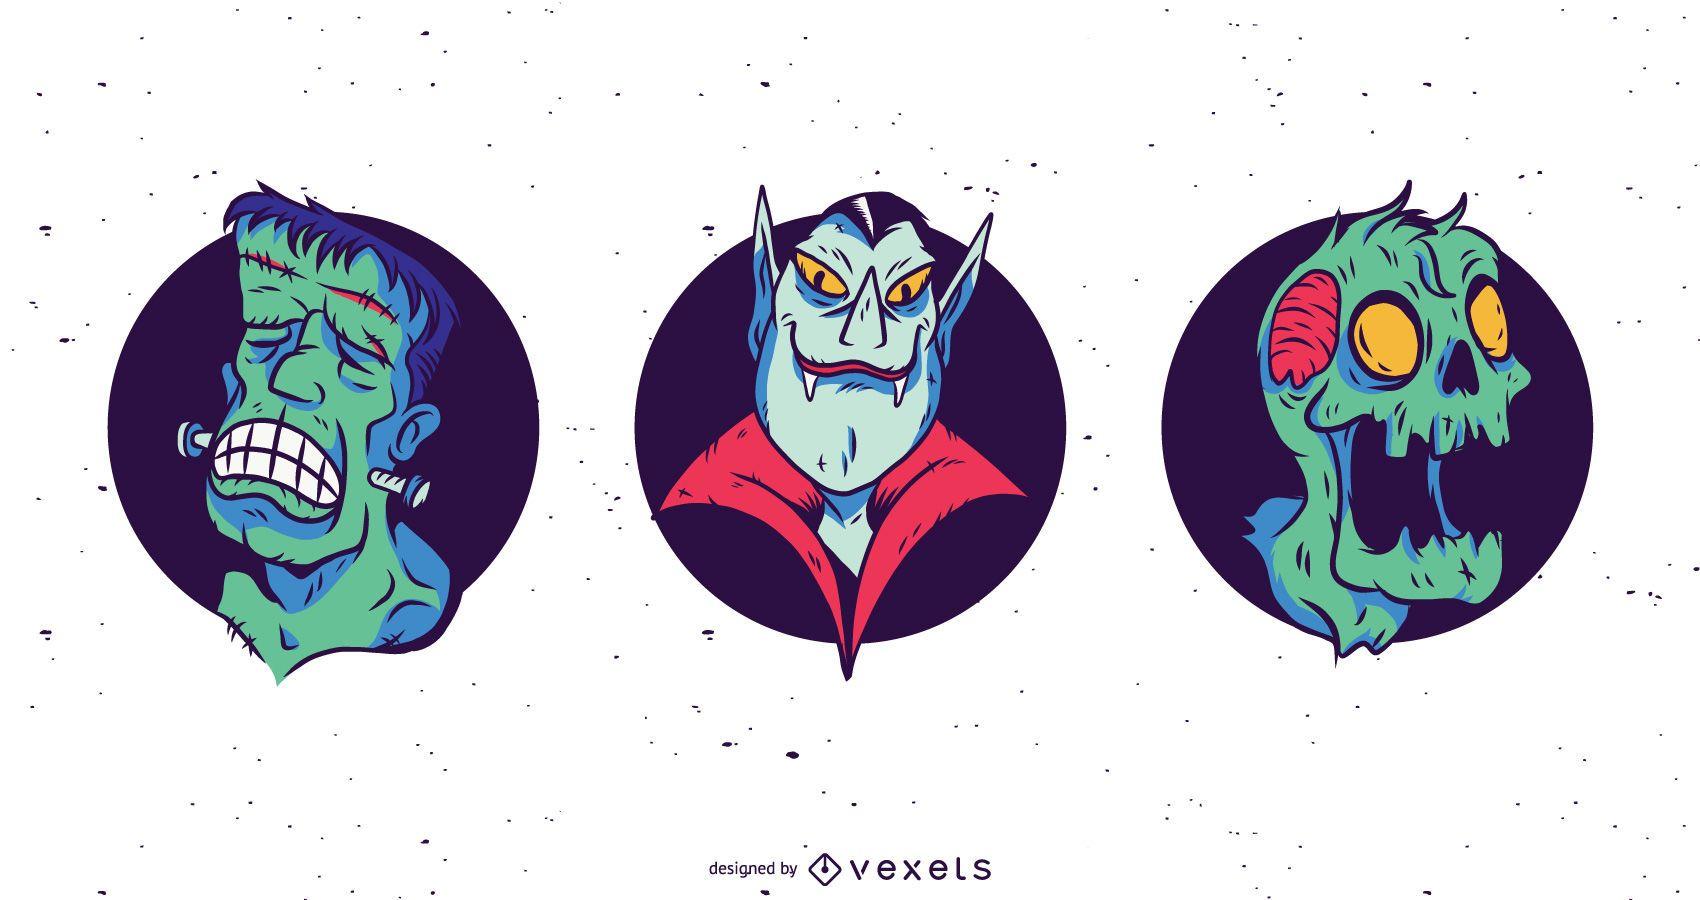 Spooky monster faces illustration